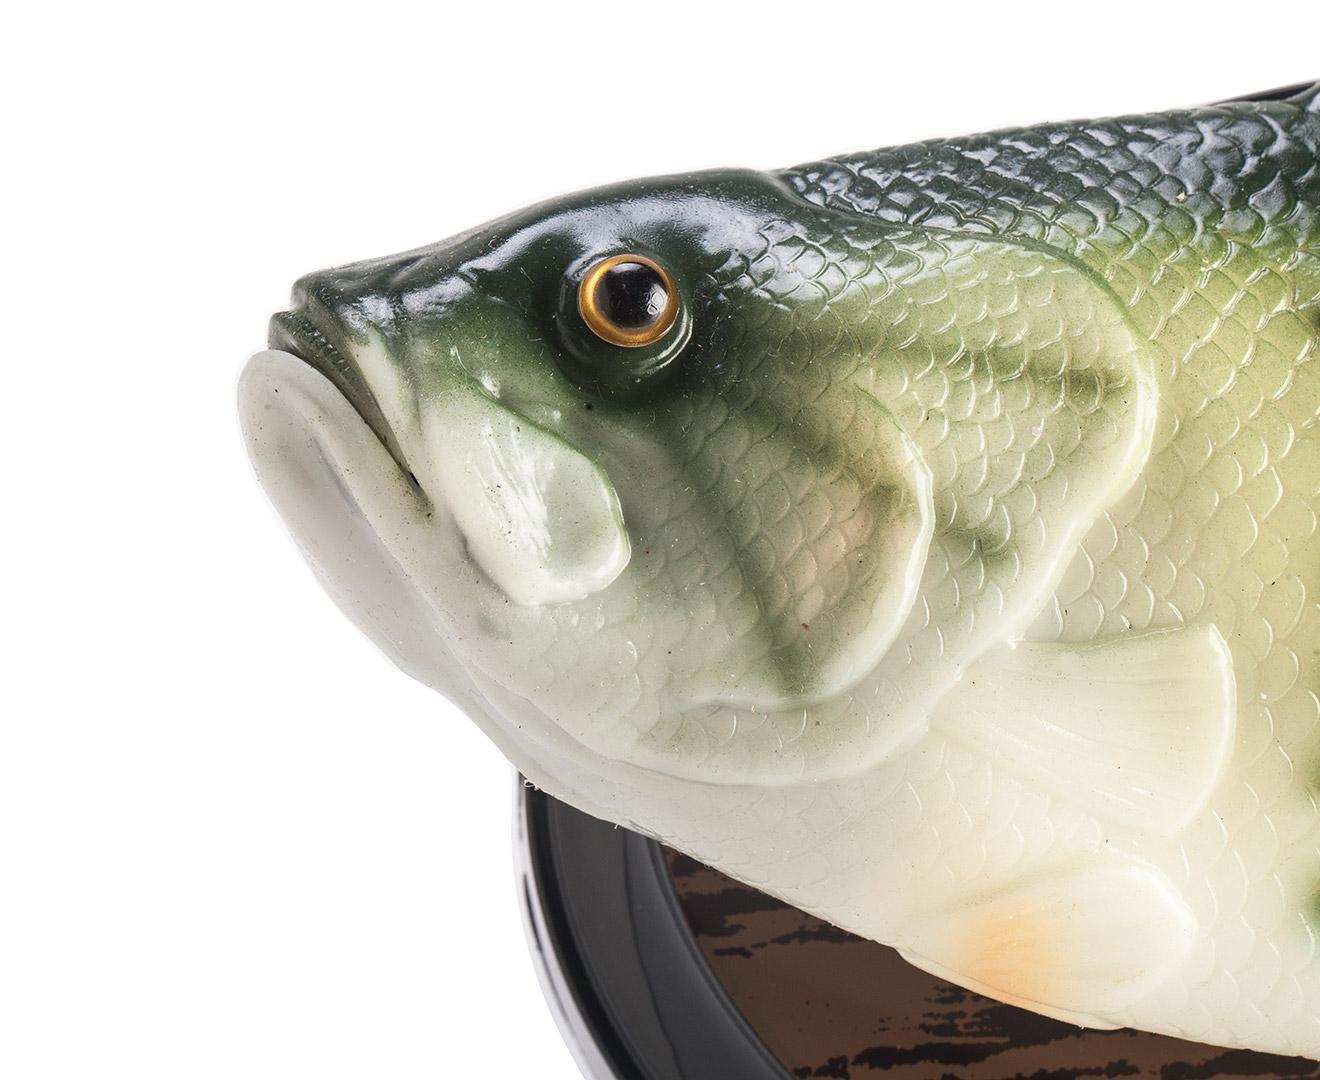 Big mouth billy bass singing fish ebay for Talking bass fish